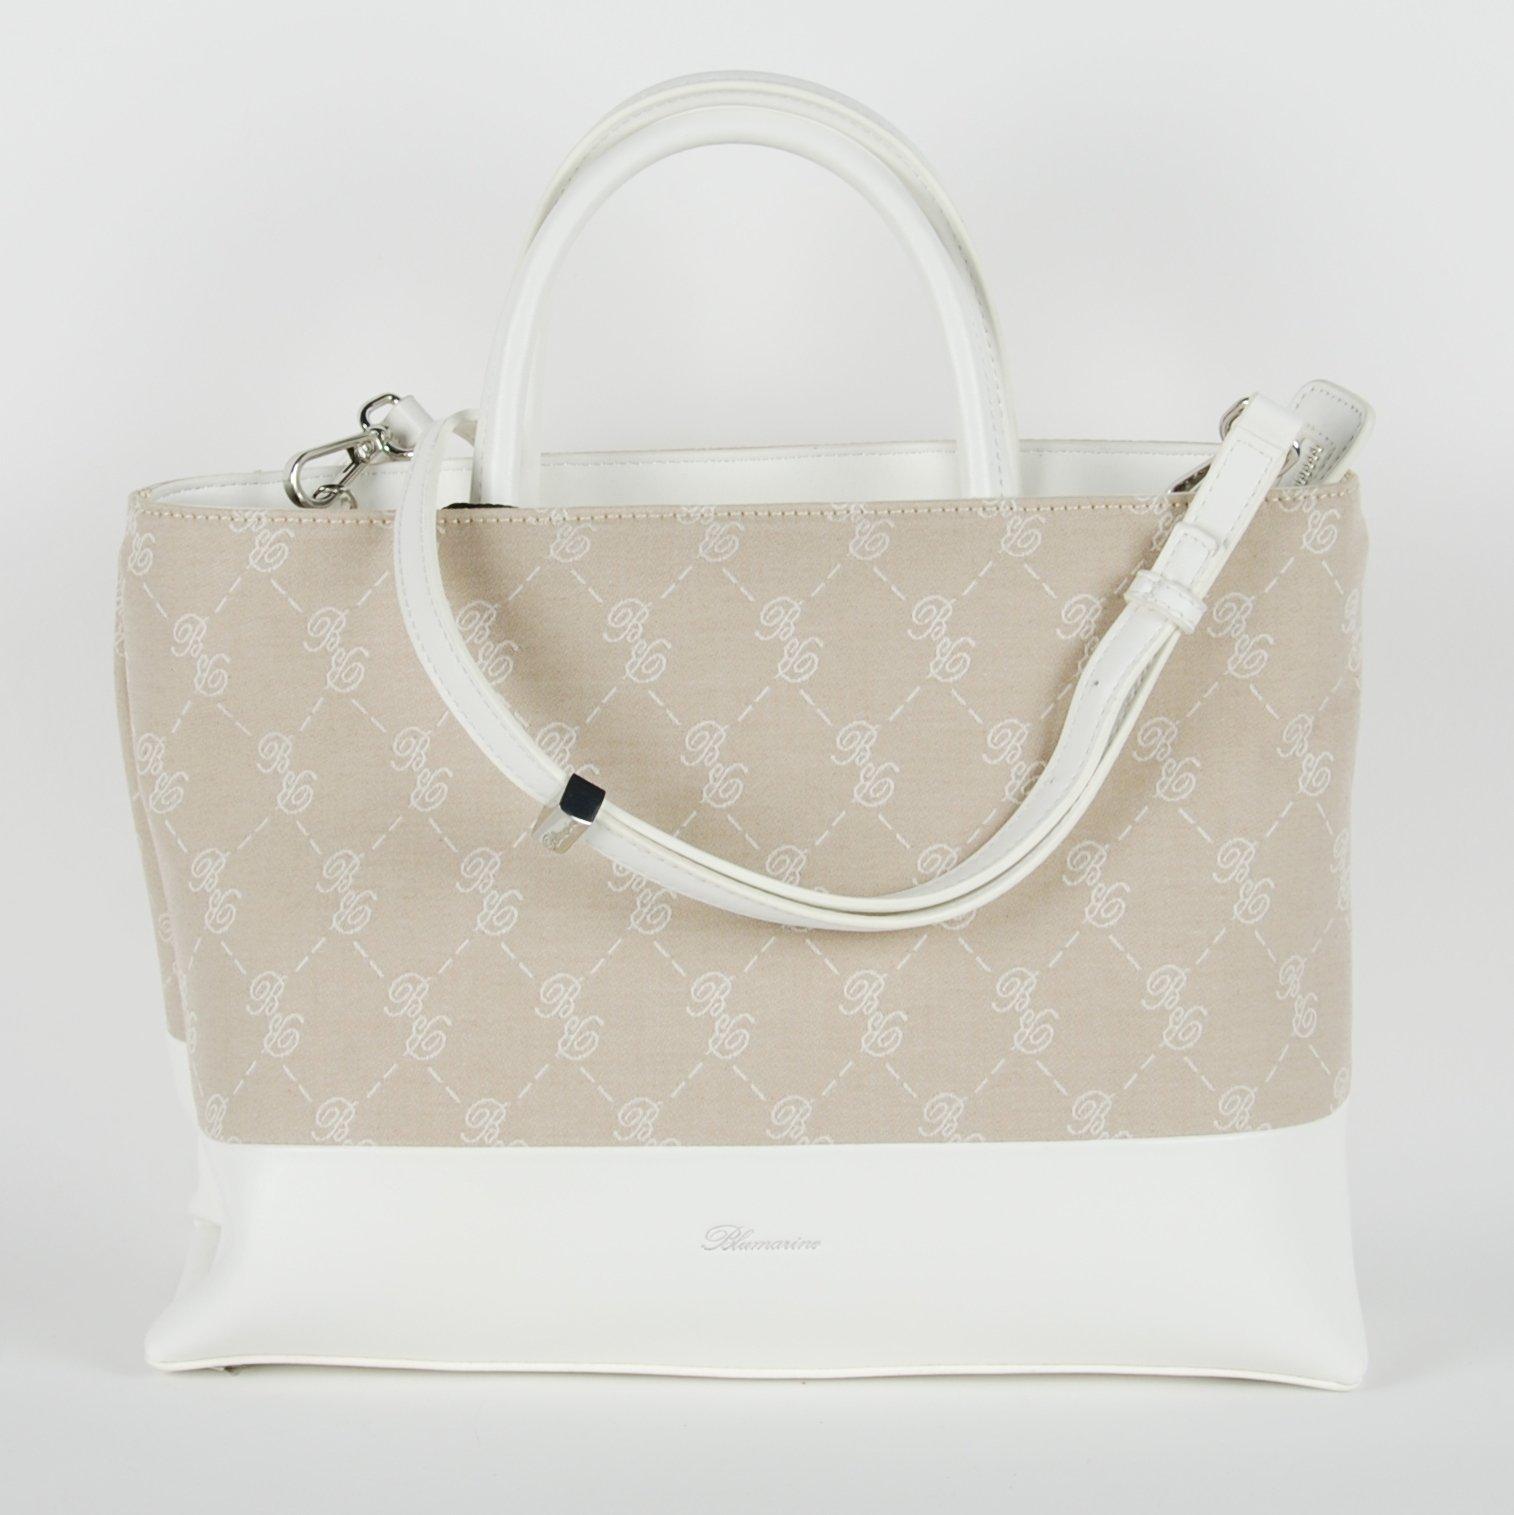 Blumarine Women's Handbag White BL1421503